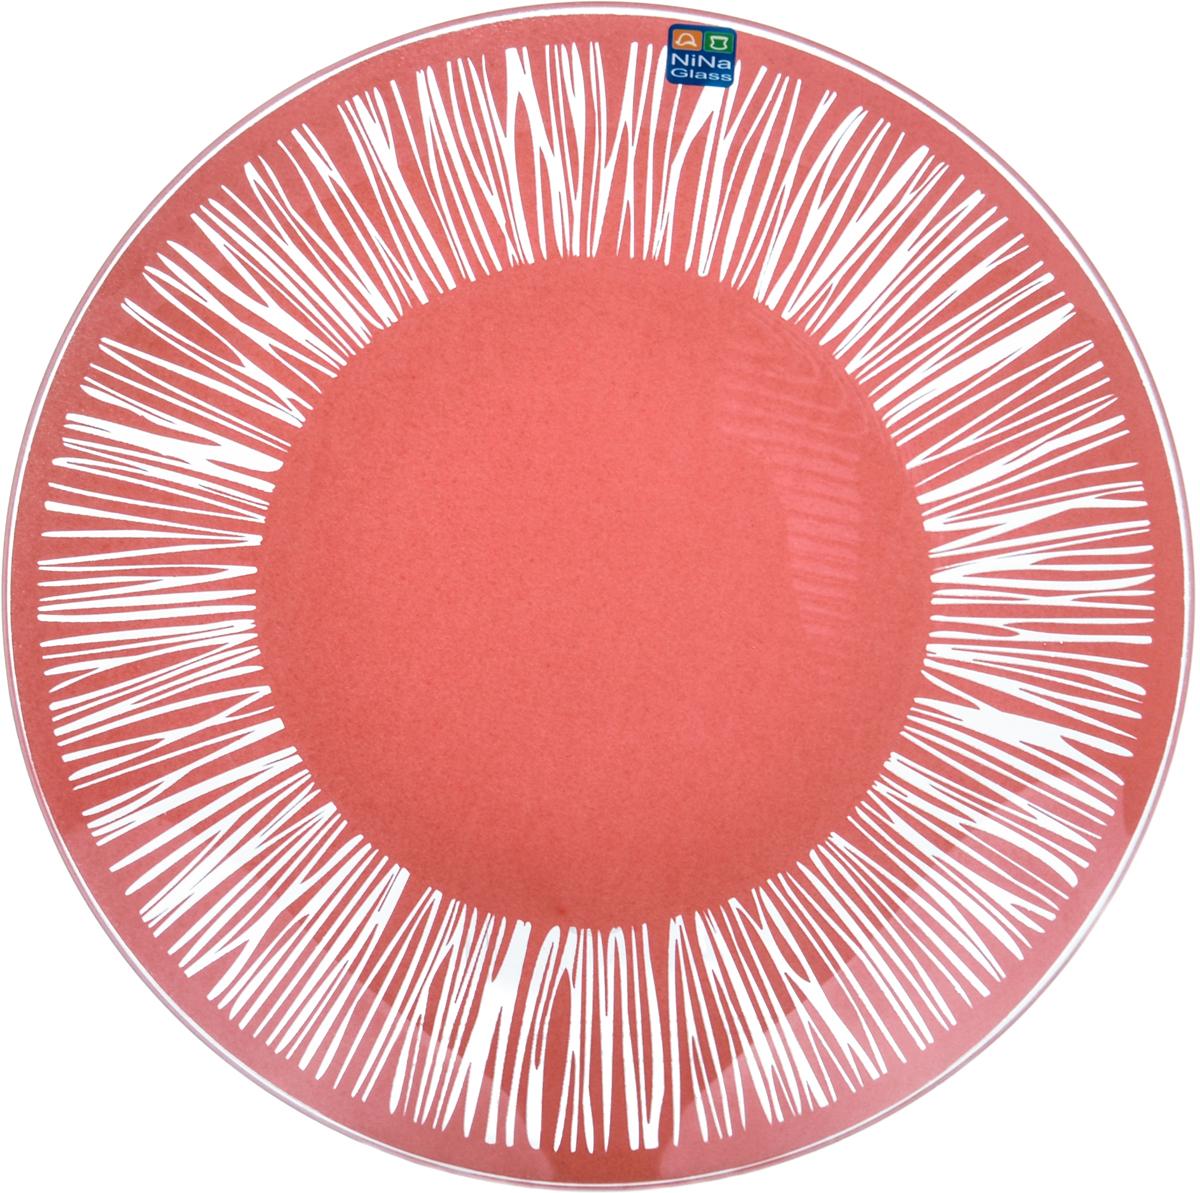 Тарелка Nina Glass Витас, цвет: коралловый, диаметр 20 см салатник nina glass ажур цвет сиреневый диаметр 16 см